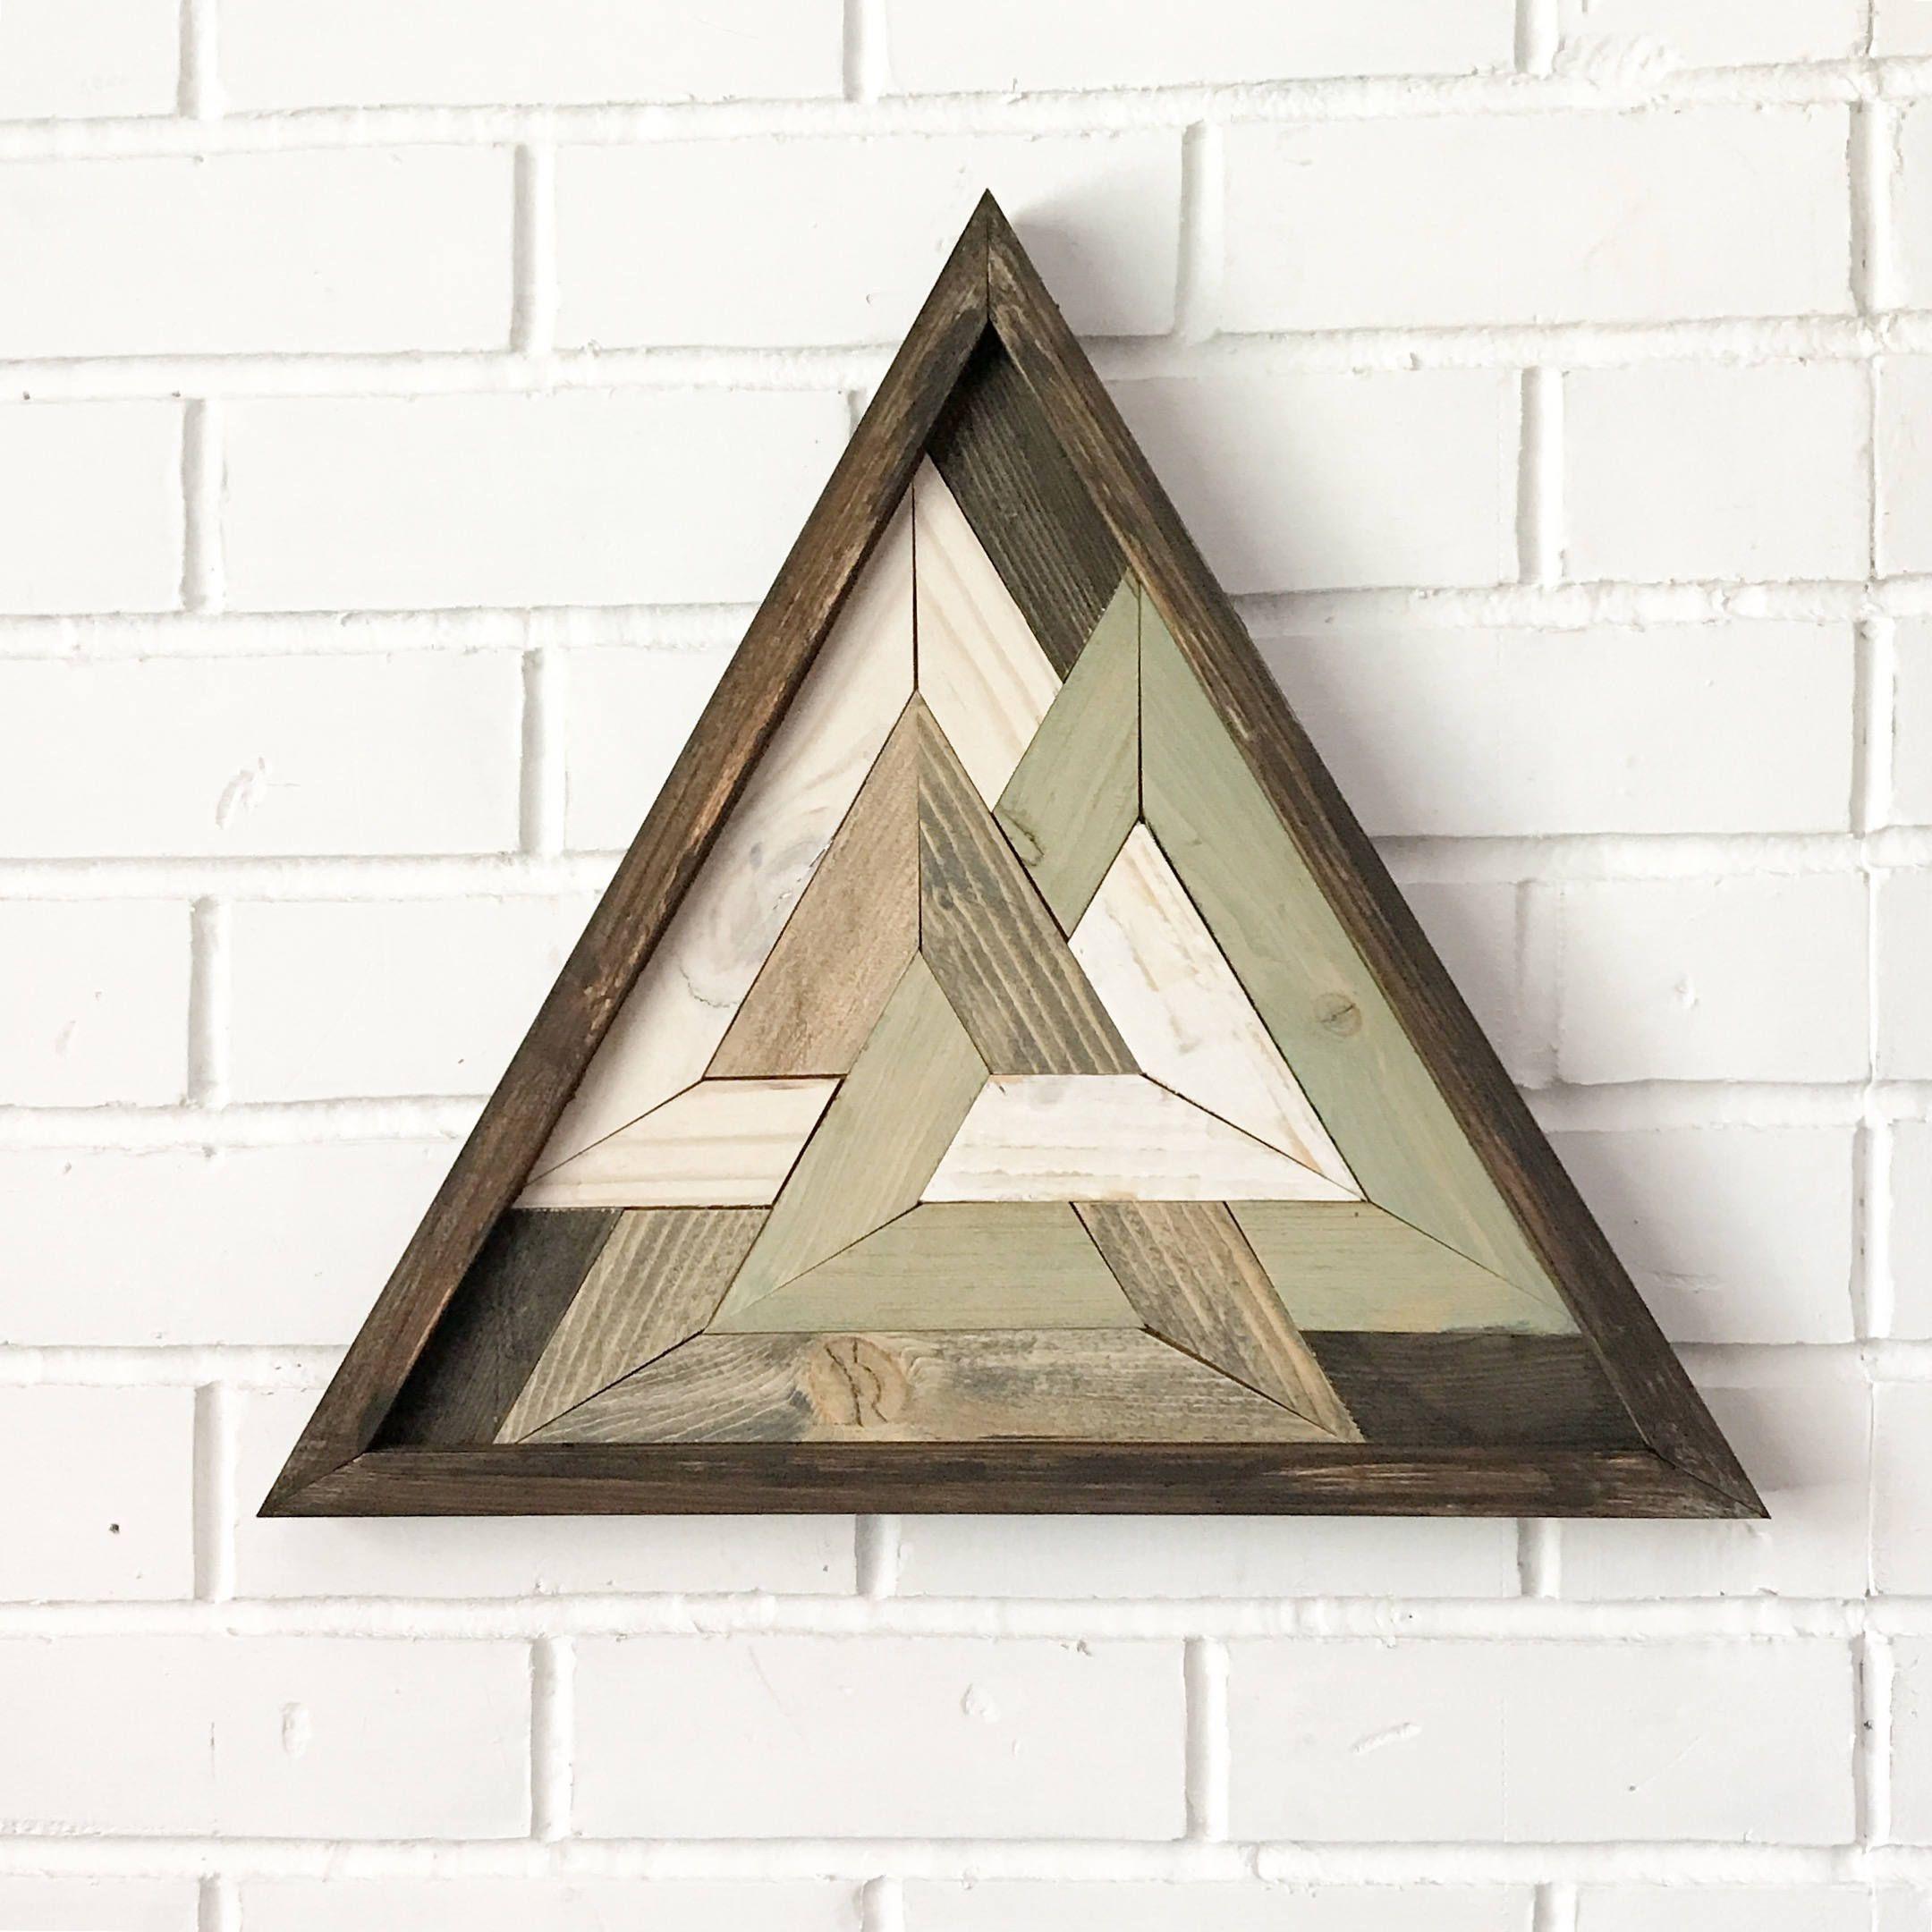 Triangle Art Design Sacred Geometry Odins Triangle Reclaimed Wooden Art By Hollybeeandcompany On Etsy Triangle Art Wooden Art Wooden Wall Art